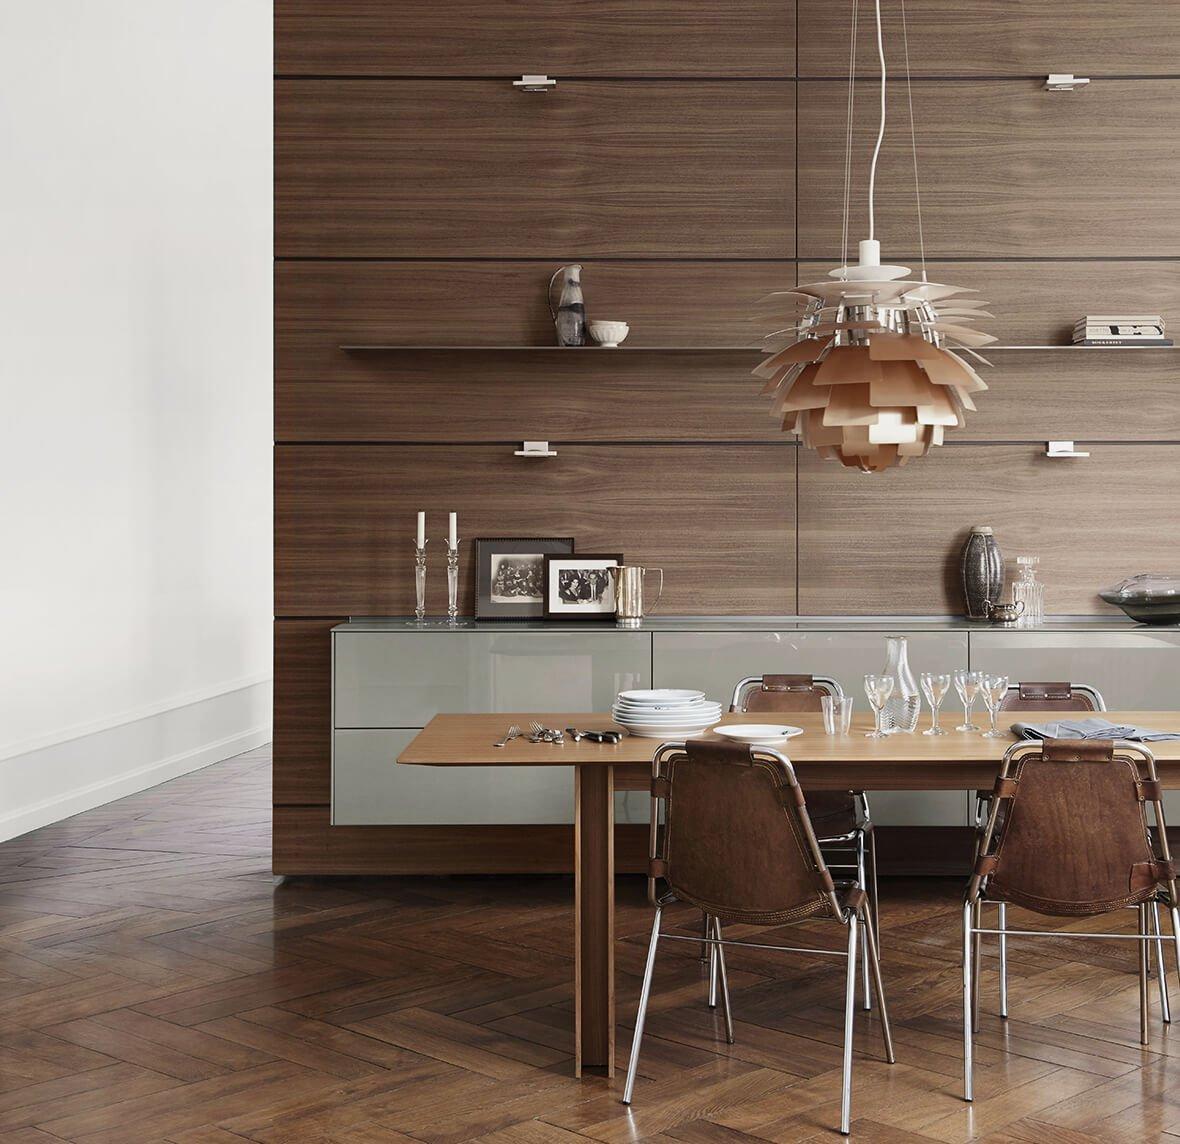 bulthaup andreas kr ger im gespr ch stilwerk news. Black Bedroom Furniture Sets. Home Design Ideas